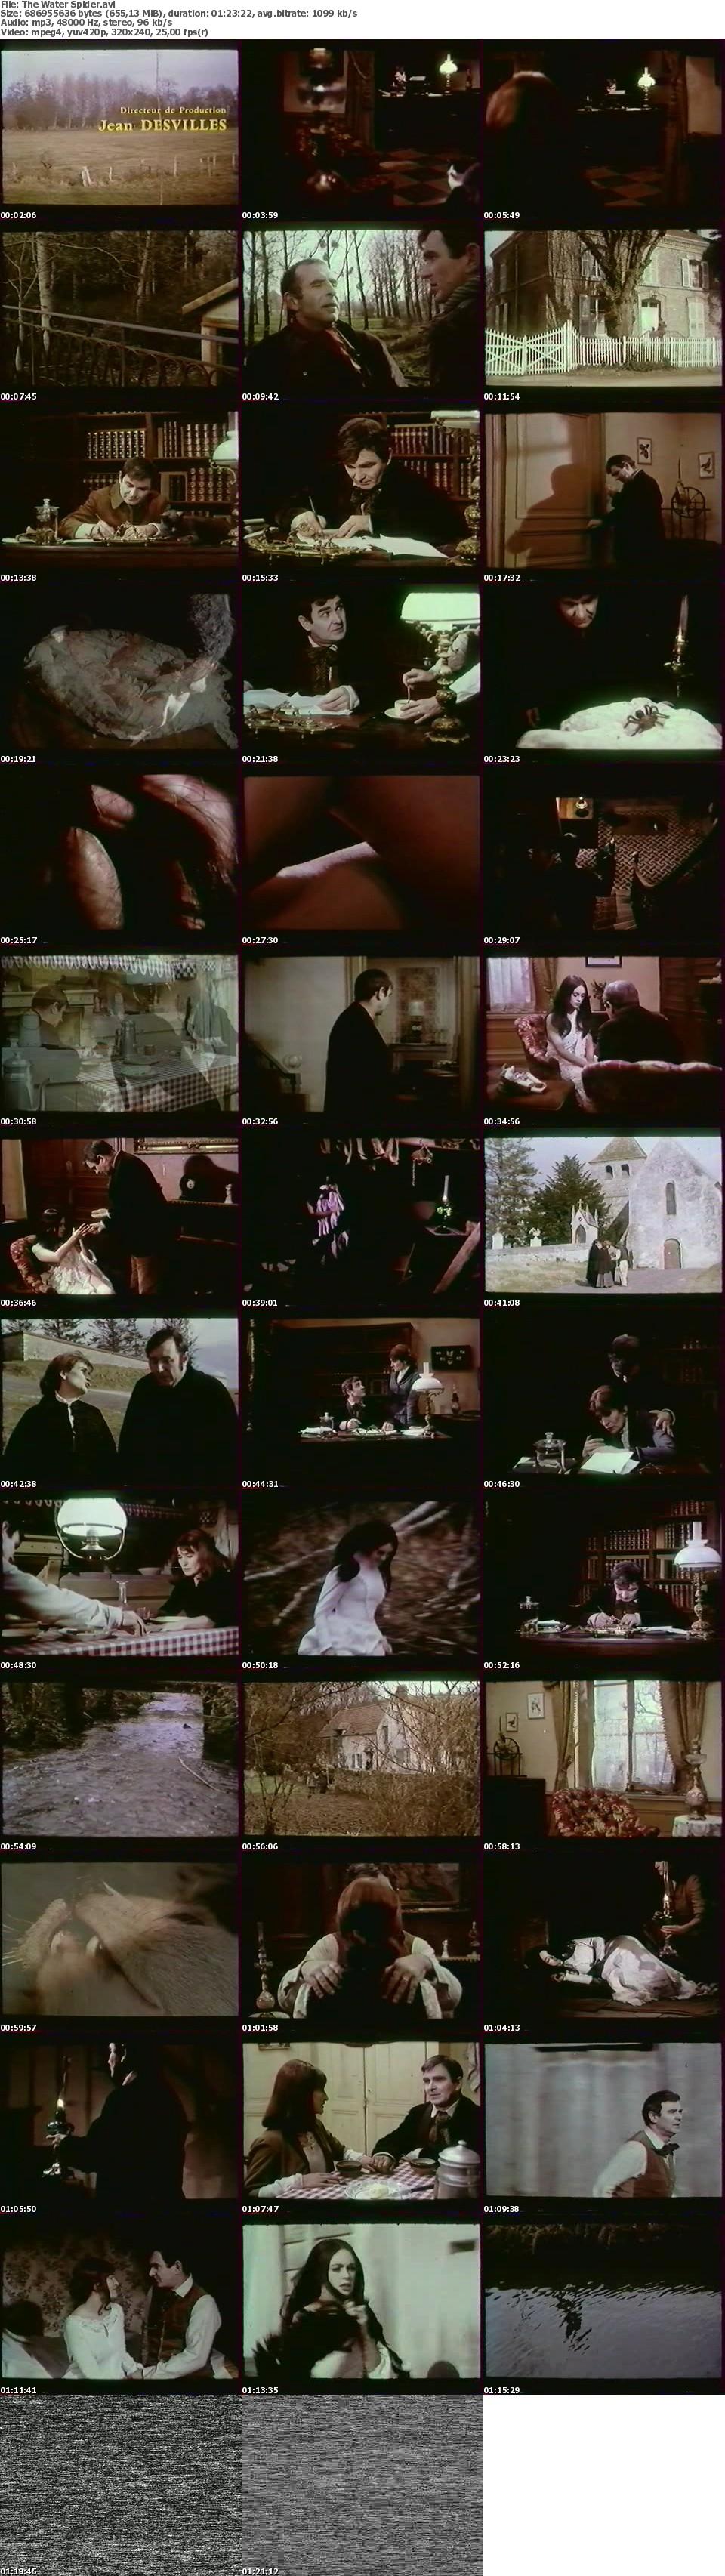 Boston Legal English Subtitles The Black Widow 66